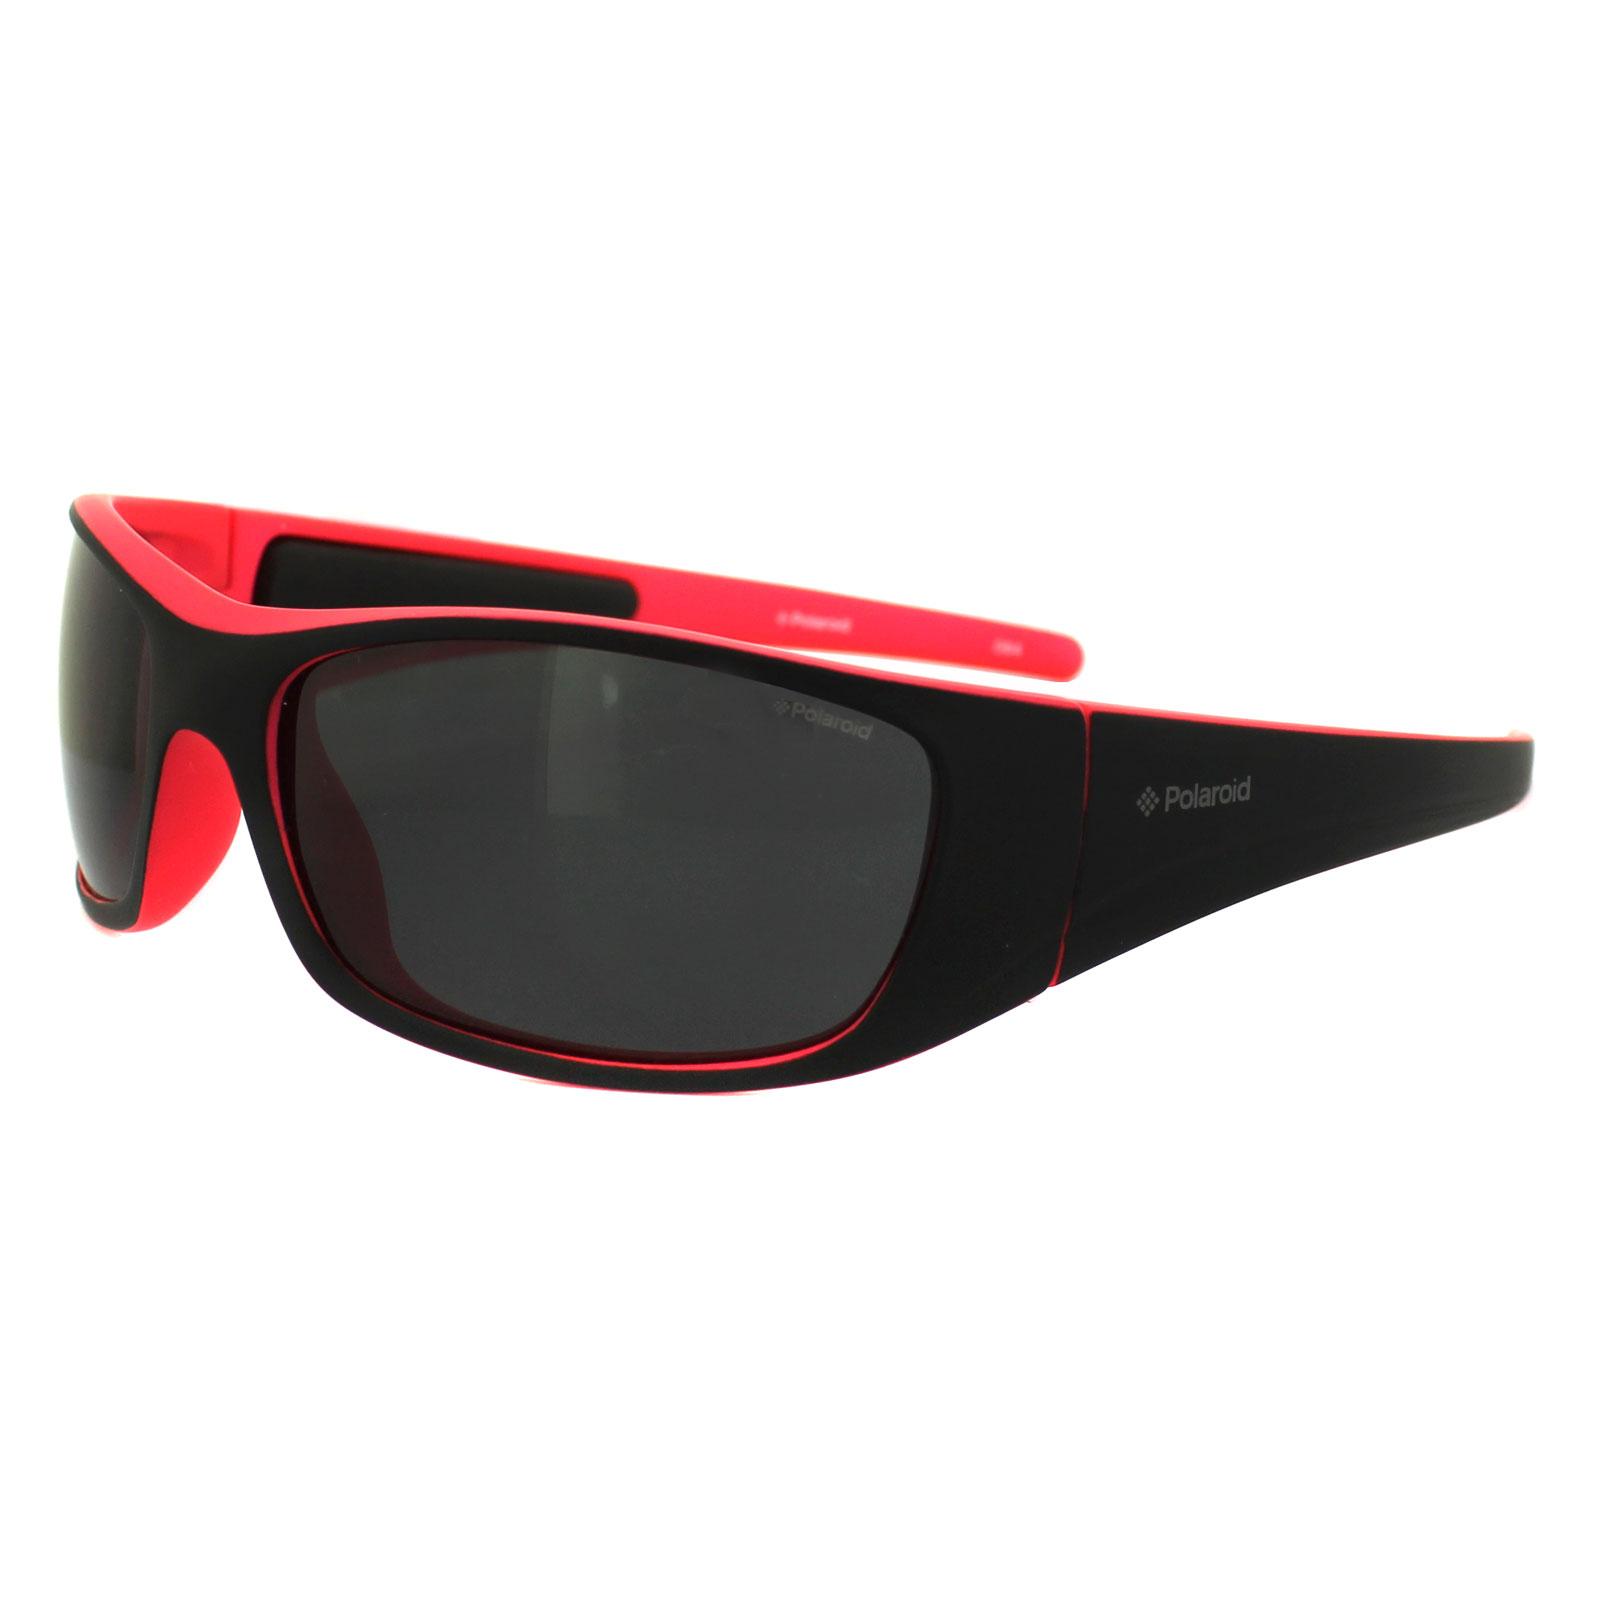 651bc058973 Sentinel Polaroid Sport Sunglasses P7420 G48 Y2 Black   Rose Grey Polarized